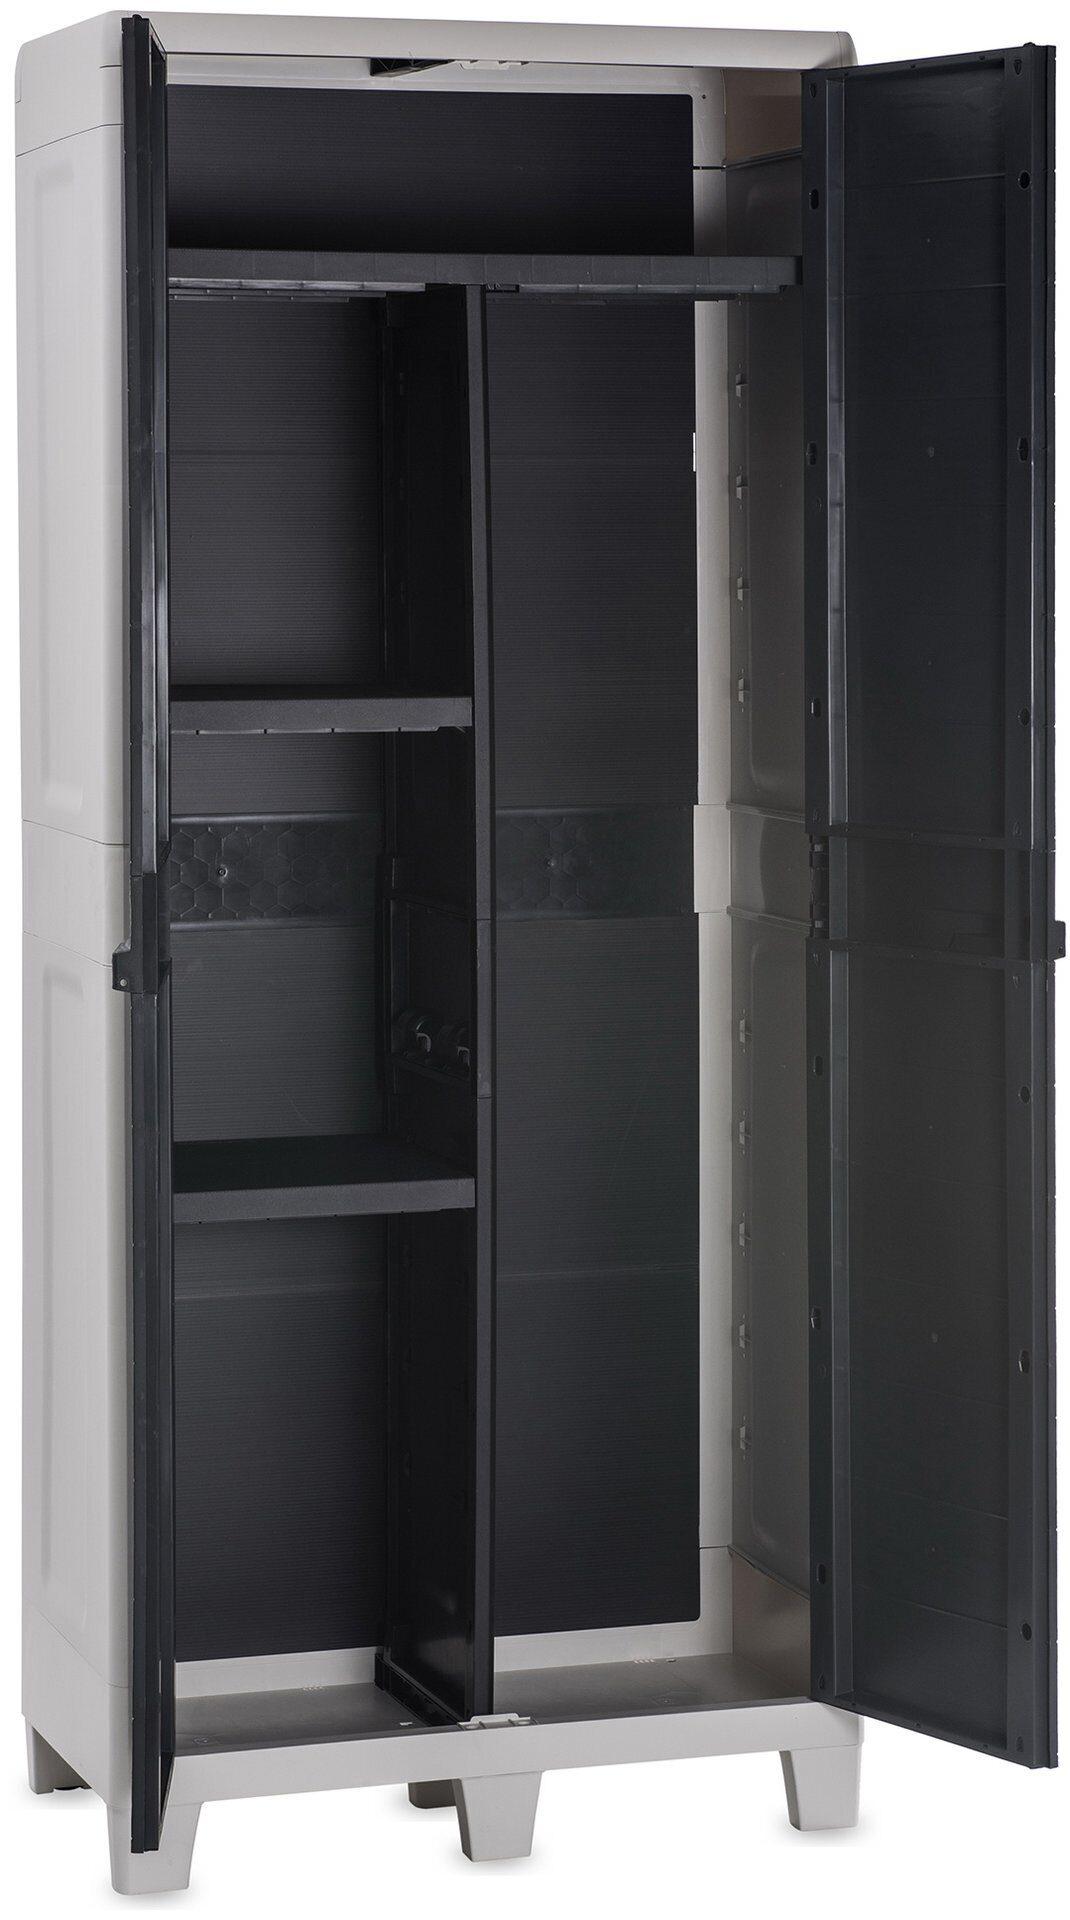 Картинки по запросу Шкаф 2х дверный глубокий WOODY'S XL, арт. 076